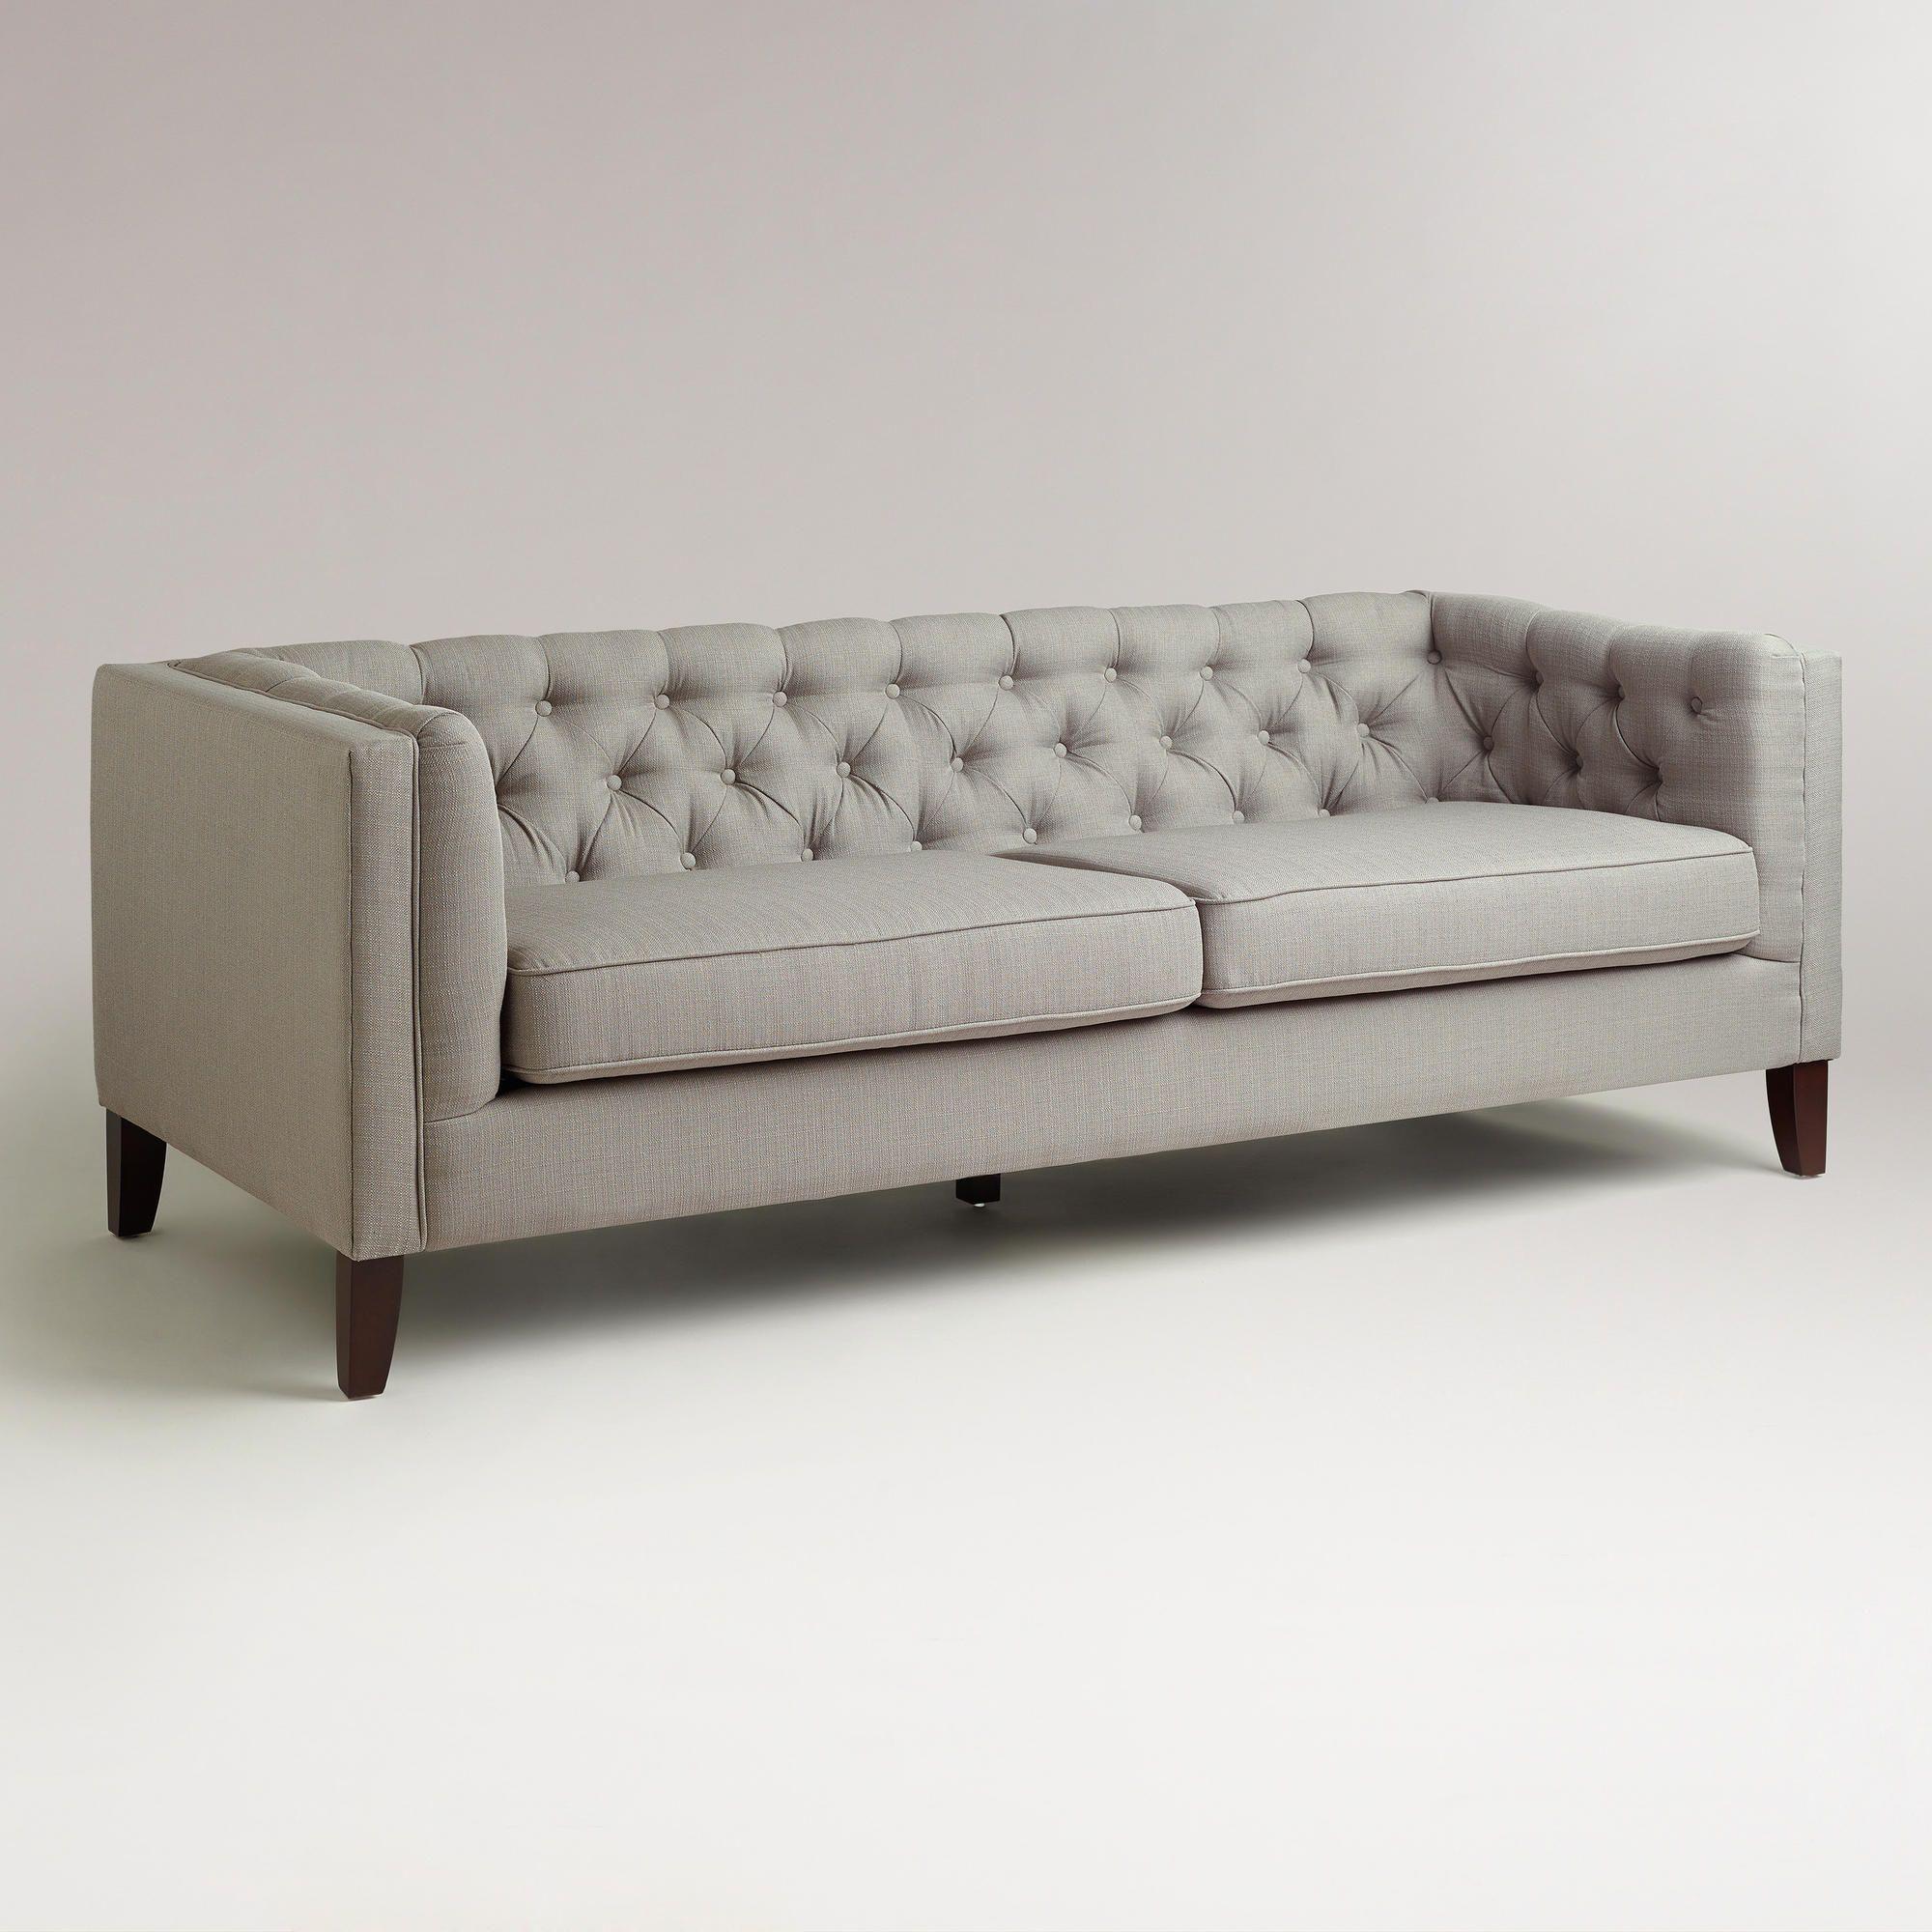 Fog Kendall Sofa World Market Affordable Sofa Apartment Decor